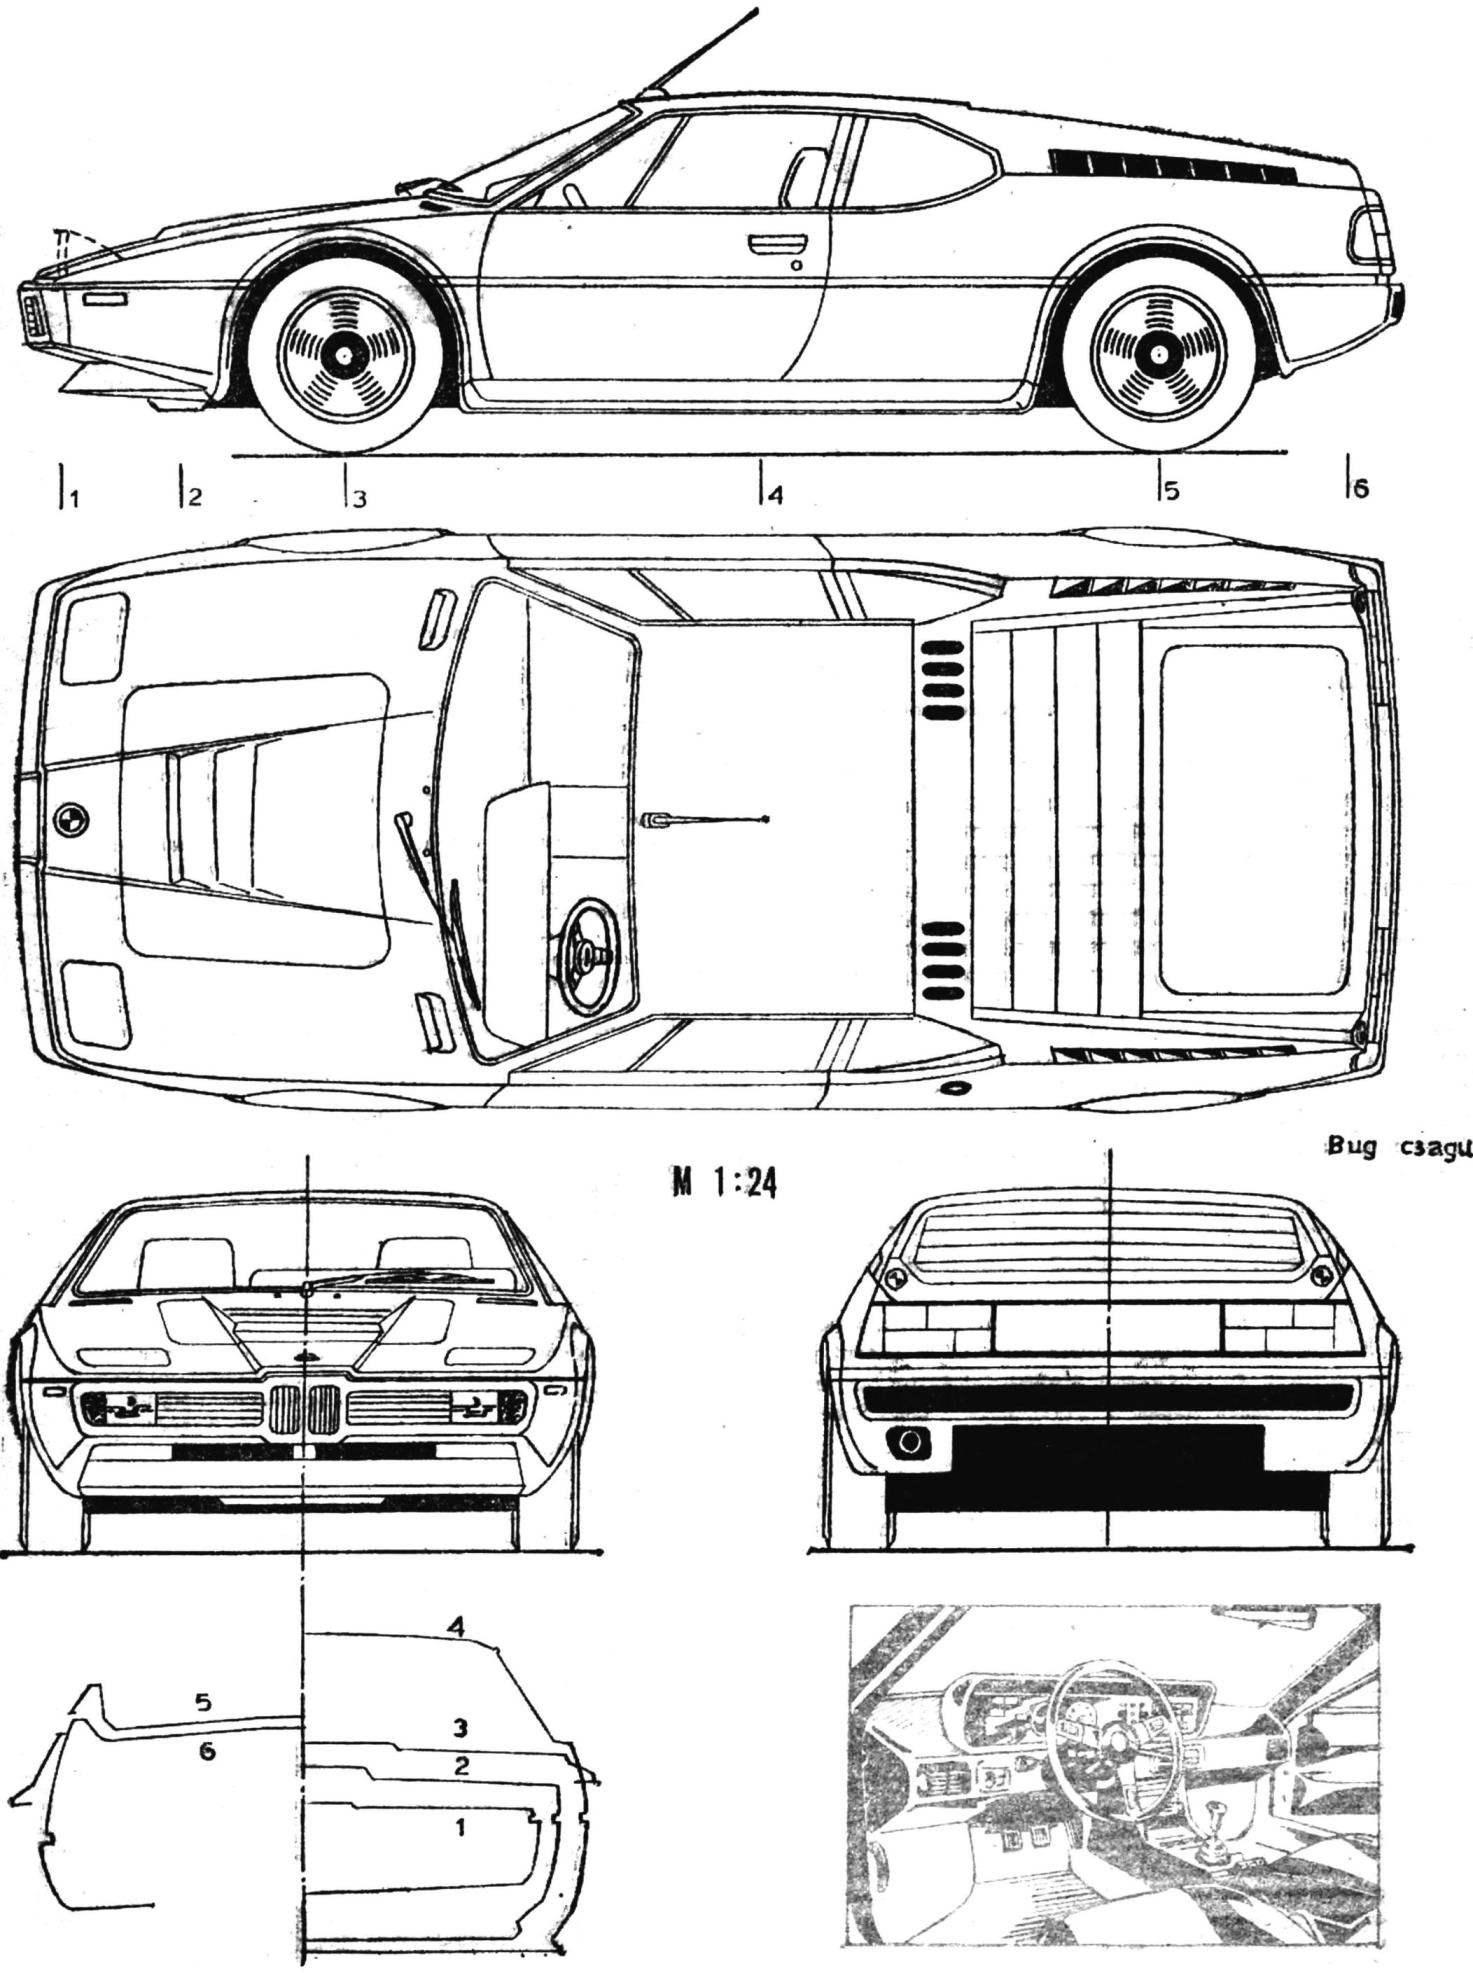 Sports car BMW-M1 - prototype trace model.